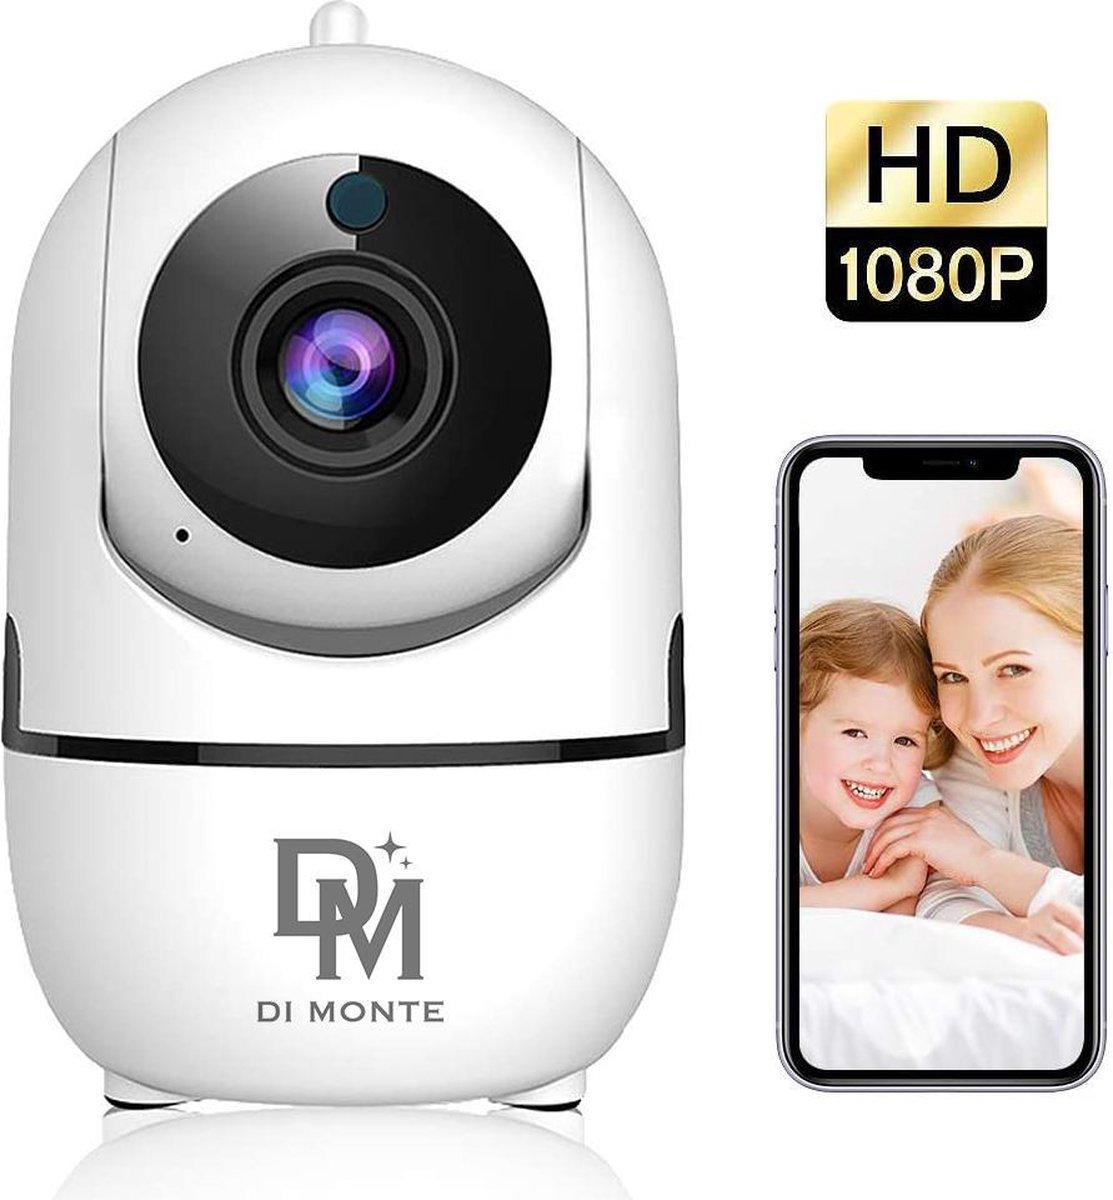 Bewakingscamera - Beveiligingscamera - Babyfoon - Babyfoon Met Camera - App - Set -  Motion en Gelui